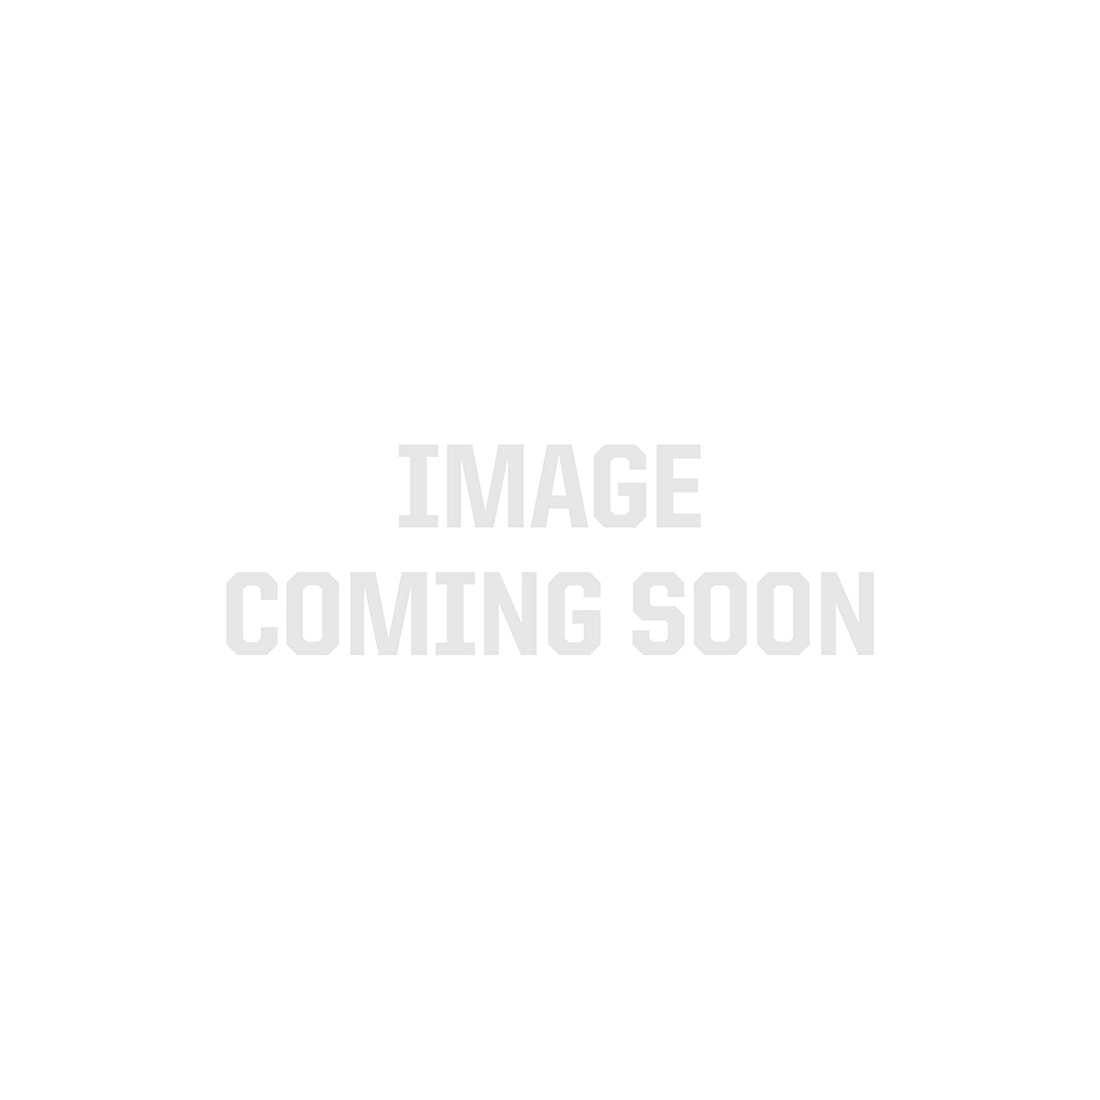 Red 5050 Single Row CurrentControl LED Strip Light, 60/m, 12mm wide, Sample Kit